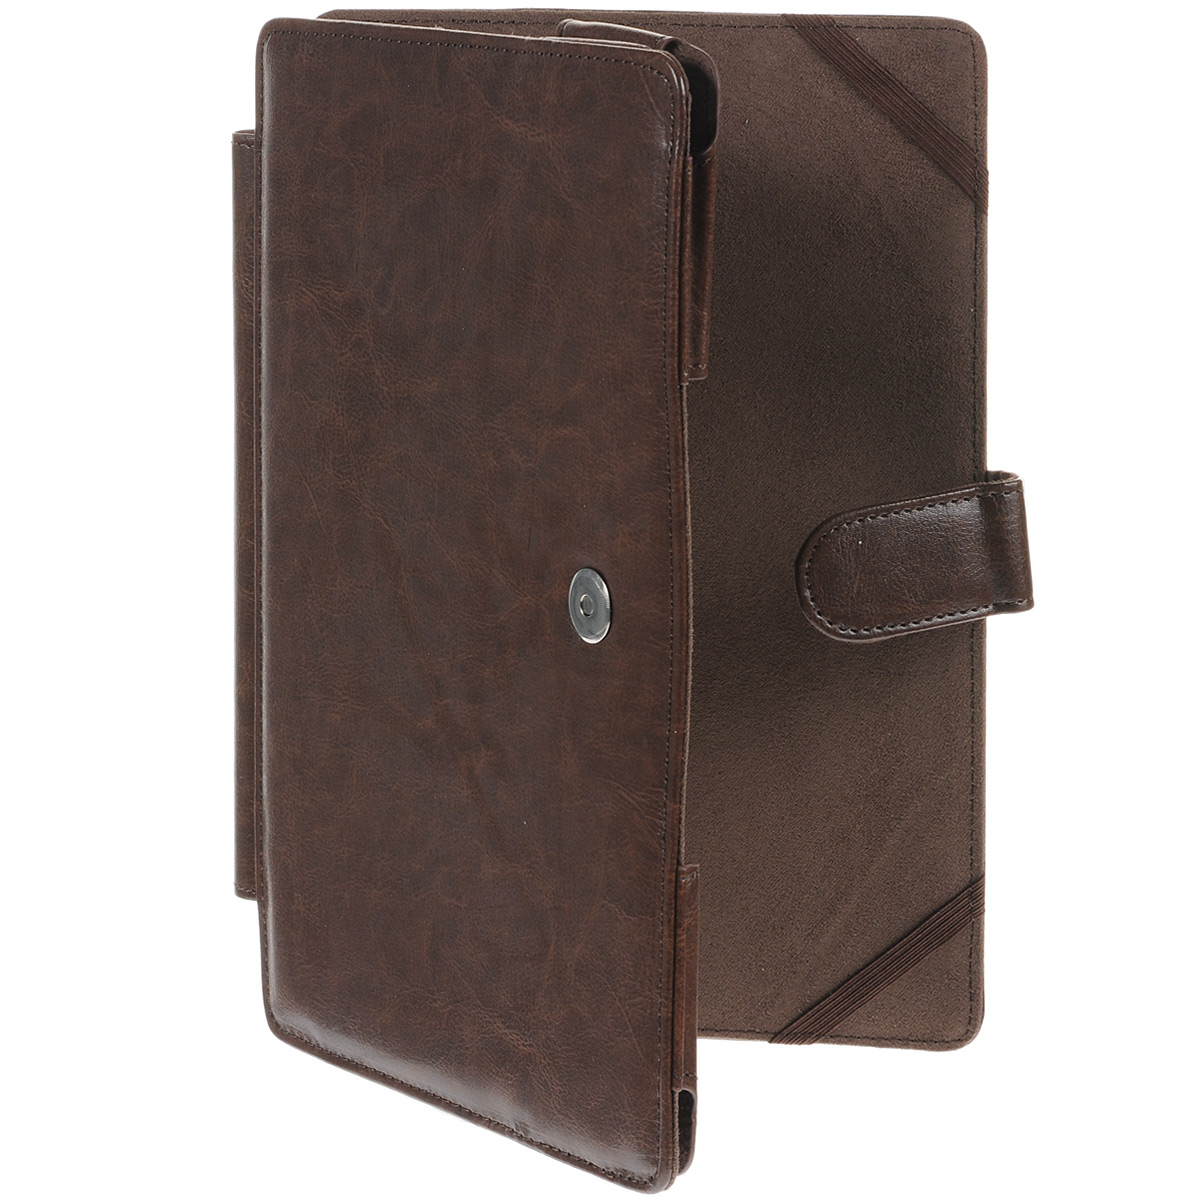 IT Baggage чехол с секцией для клавиатуры для Asus TF701/TF700, Brown it baggage чехол для asus zenpad 10 z300 black